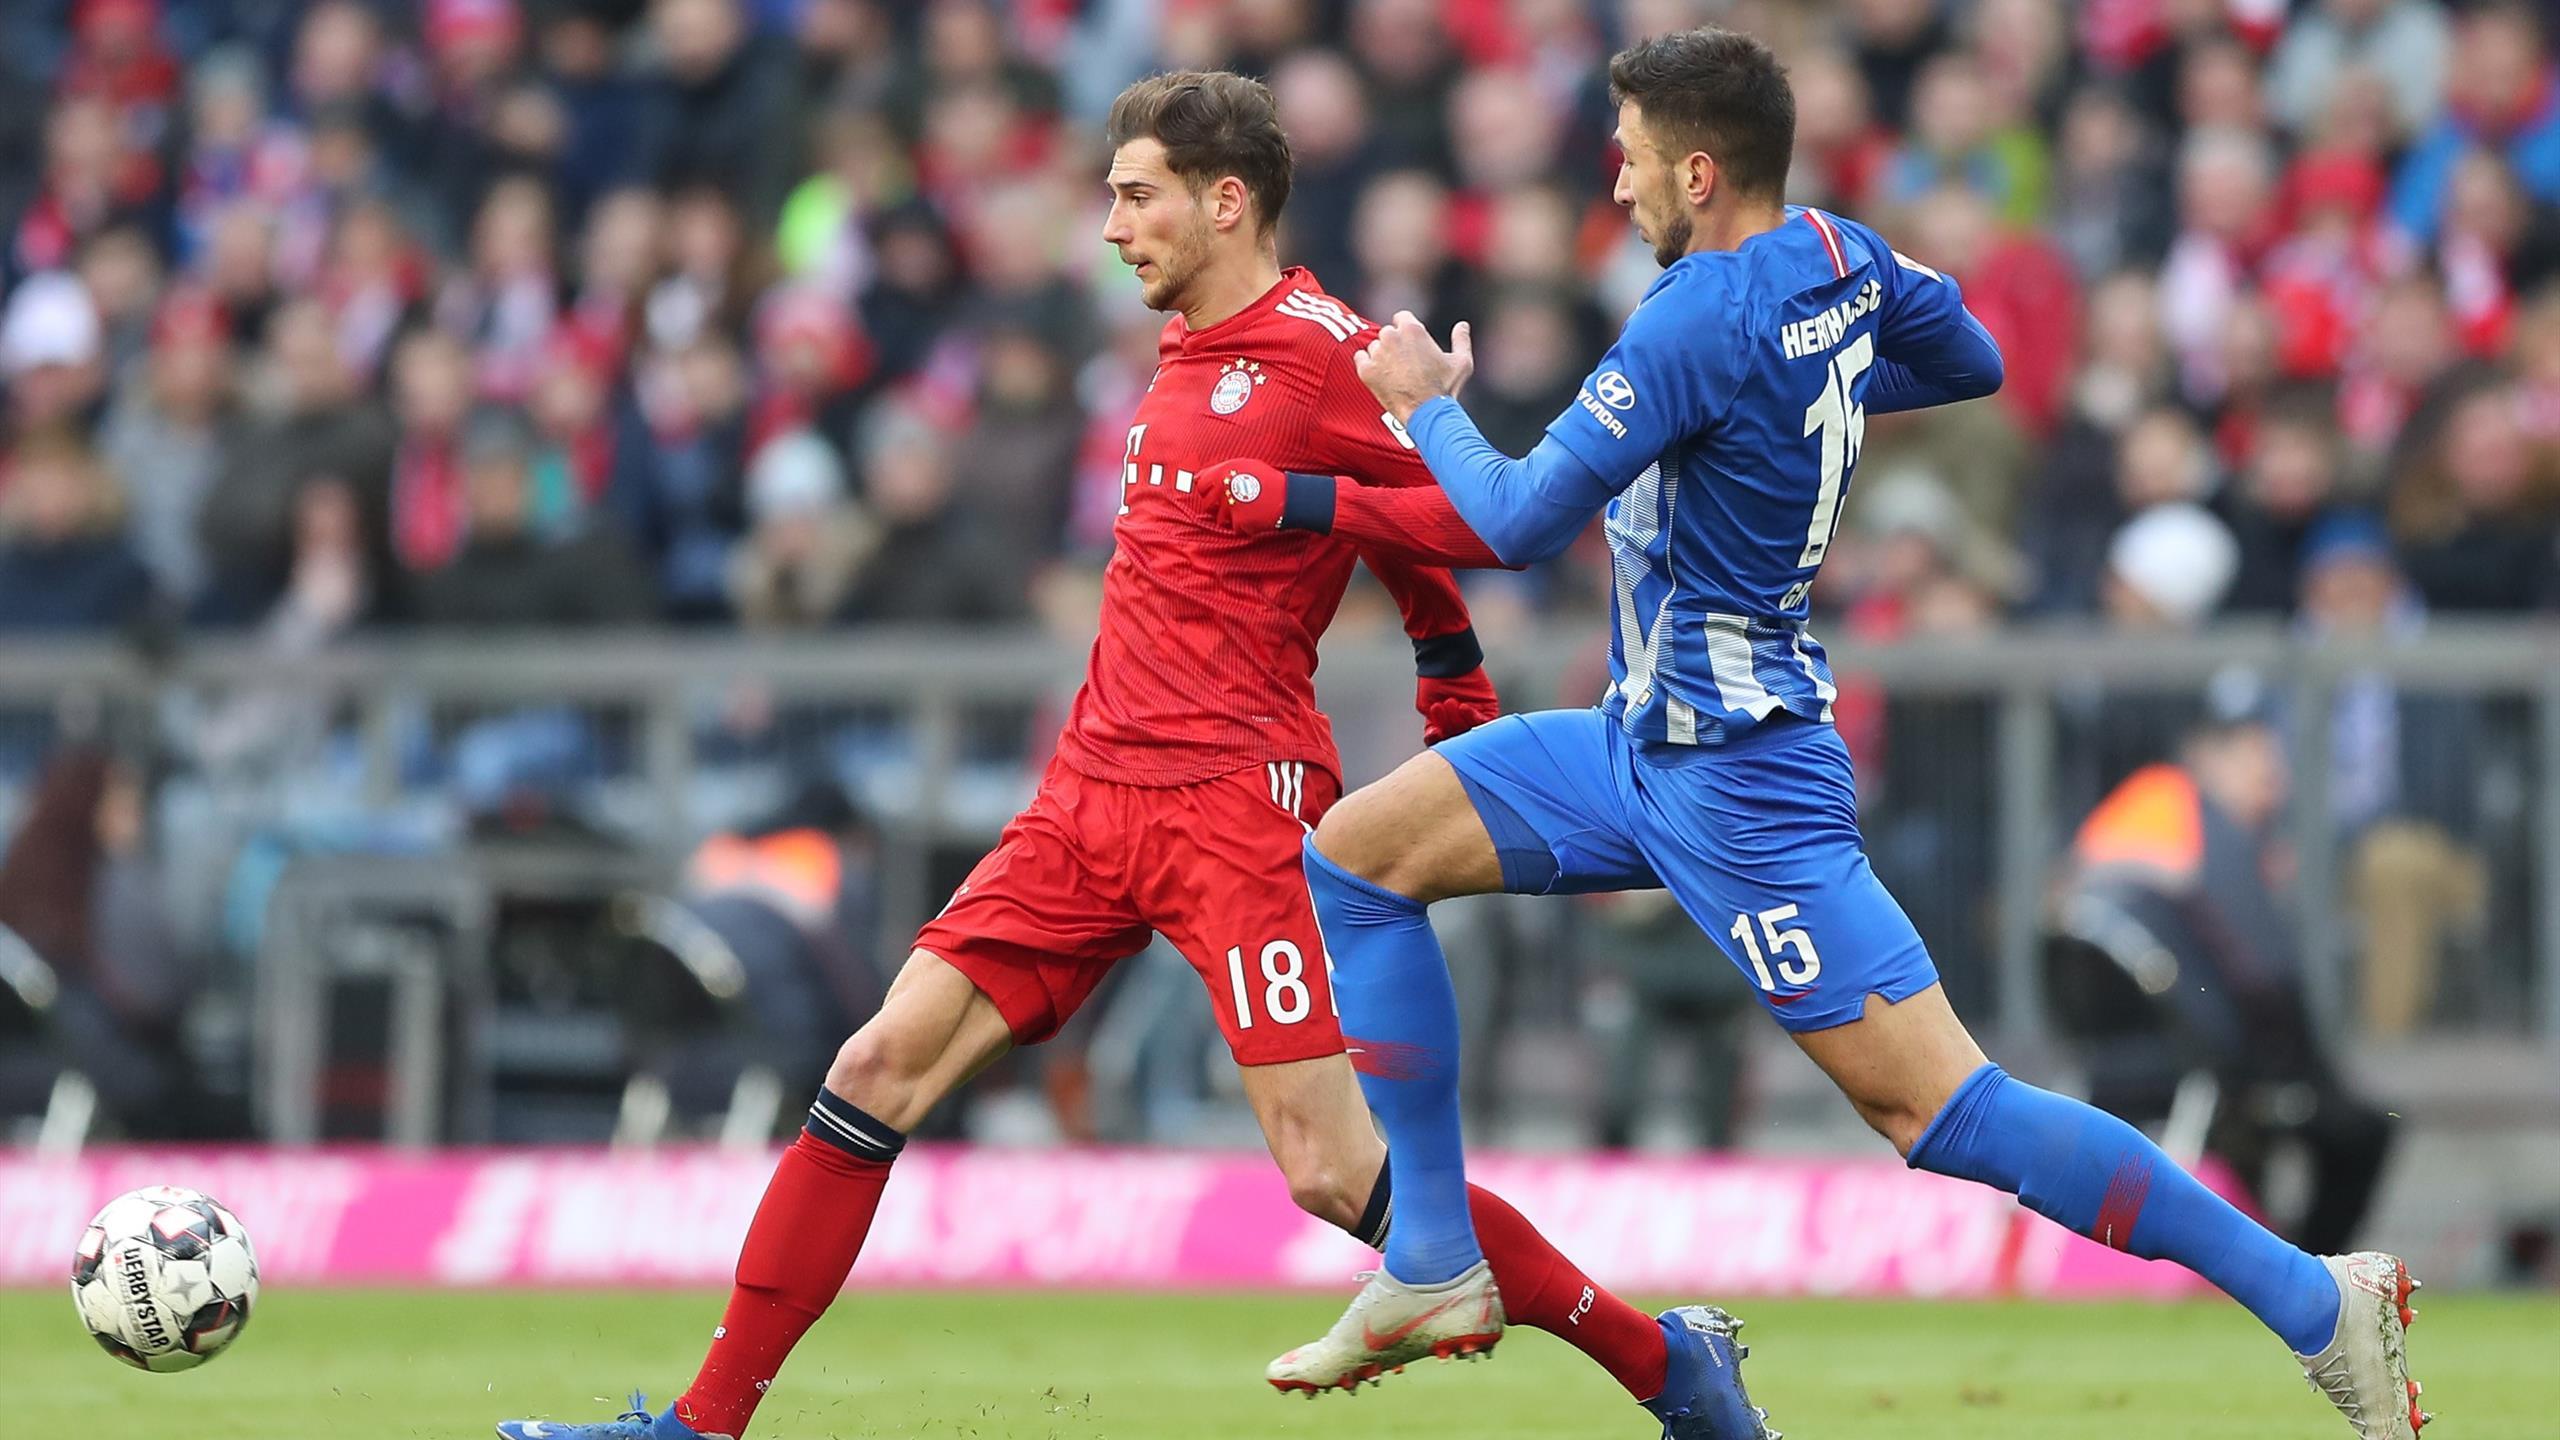 Hertha Bayern Im Tv